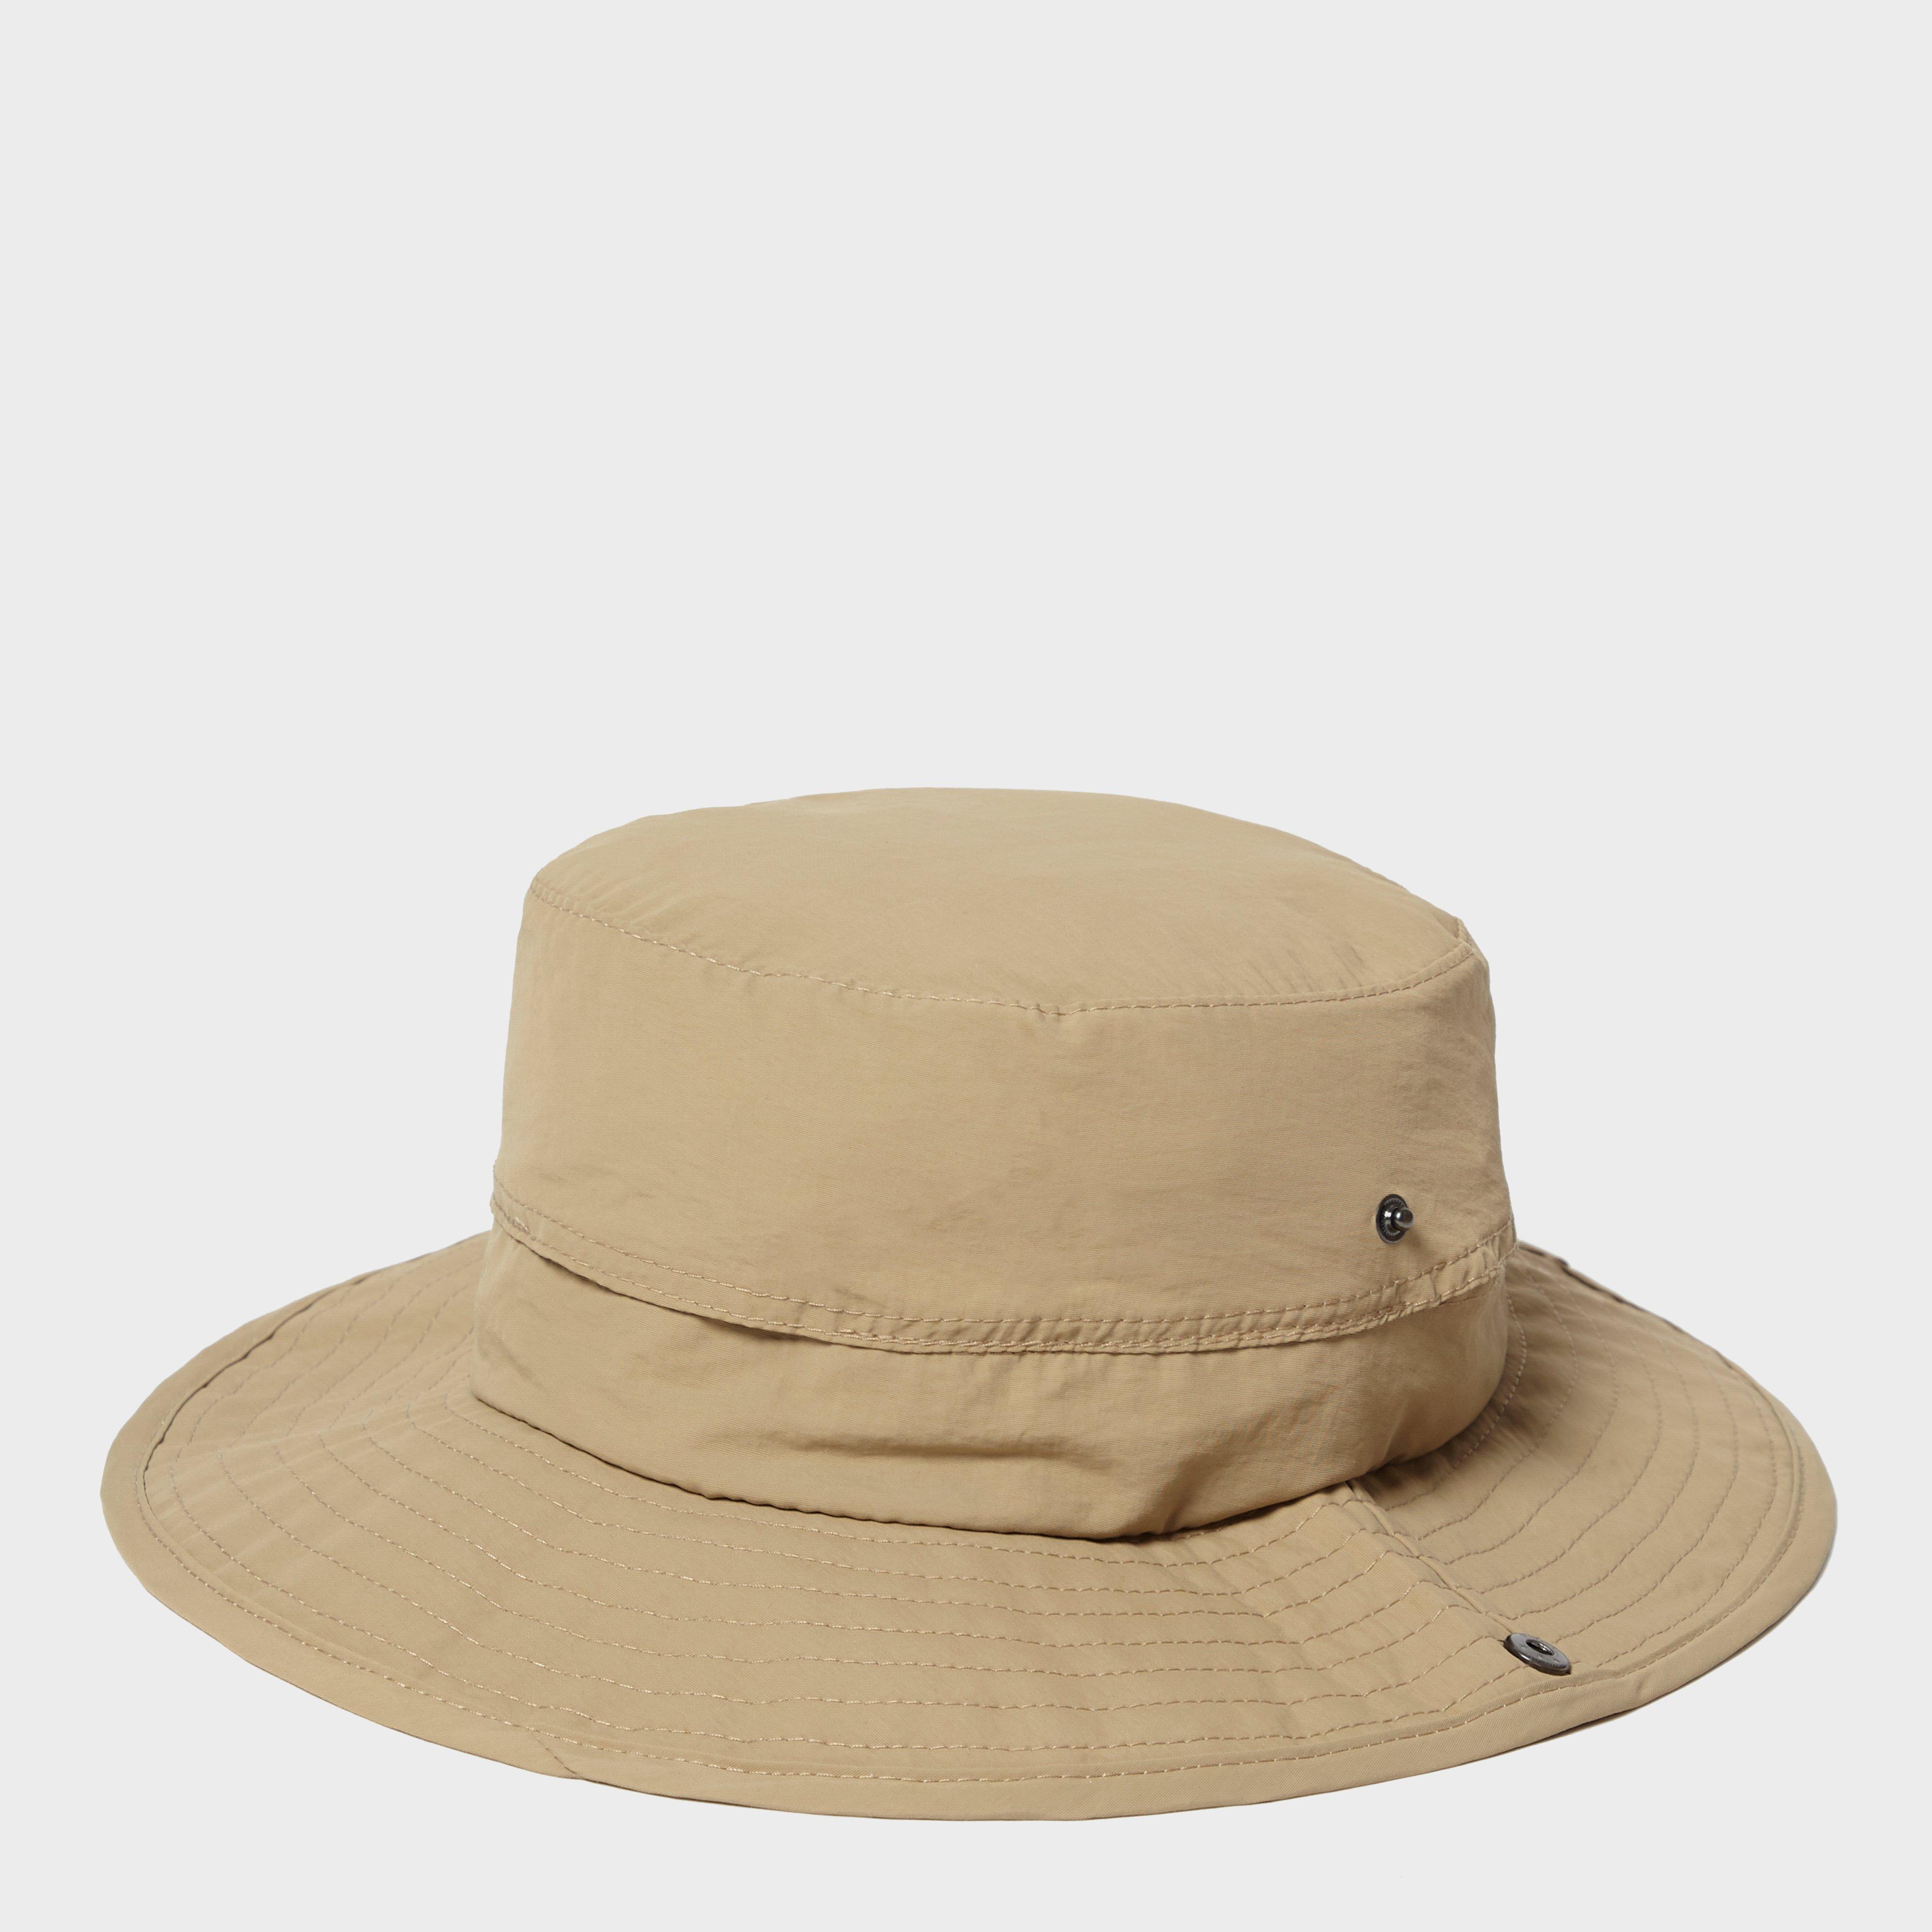 Peter Storm Mens Floppy Sun Hat - Beige/ecu  Beige/ecu